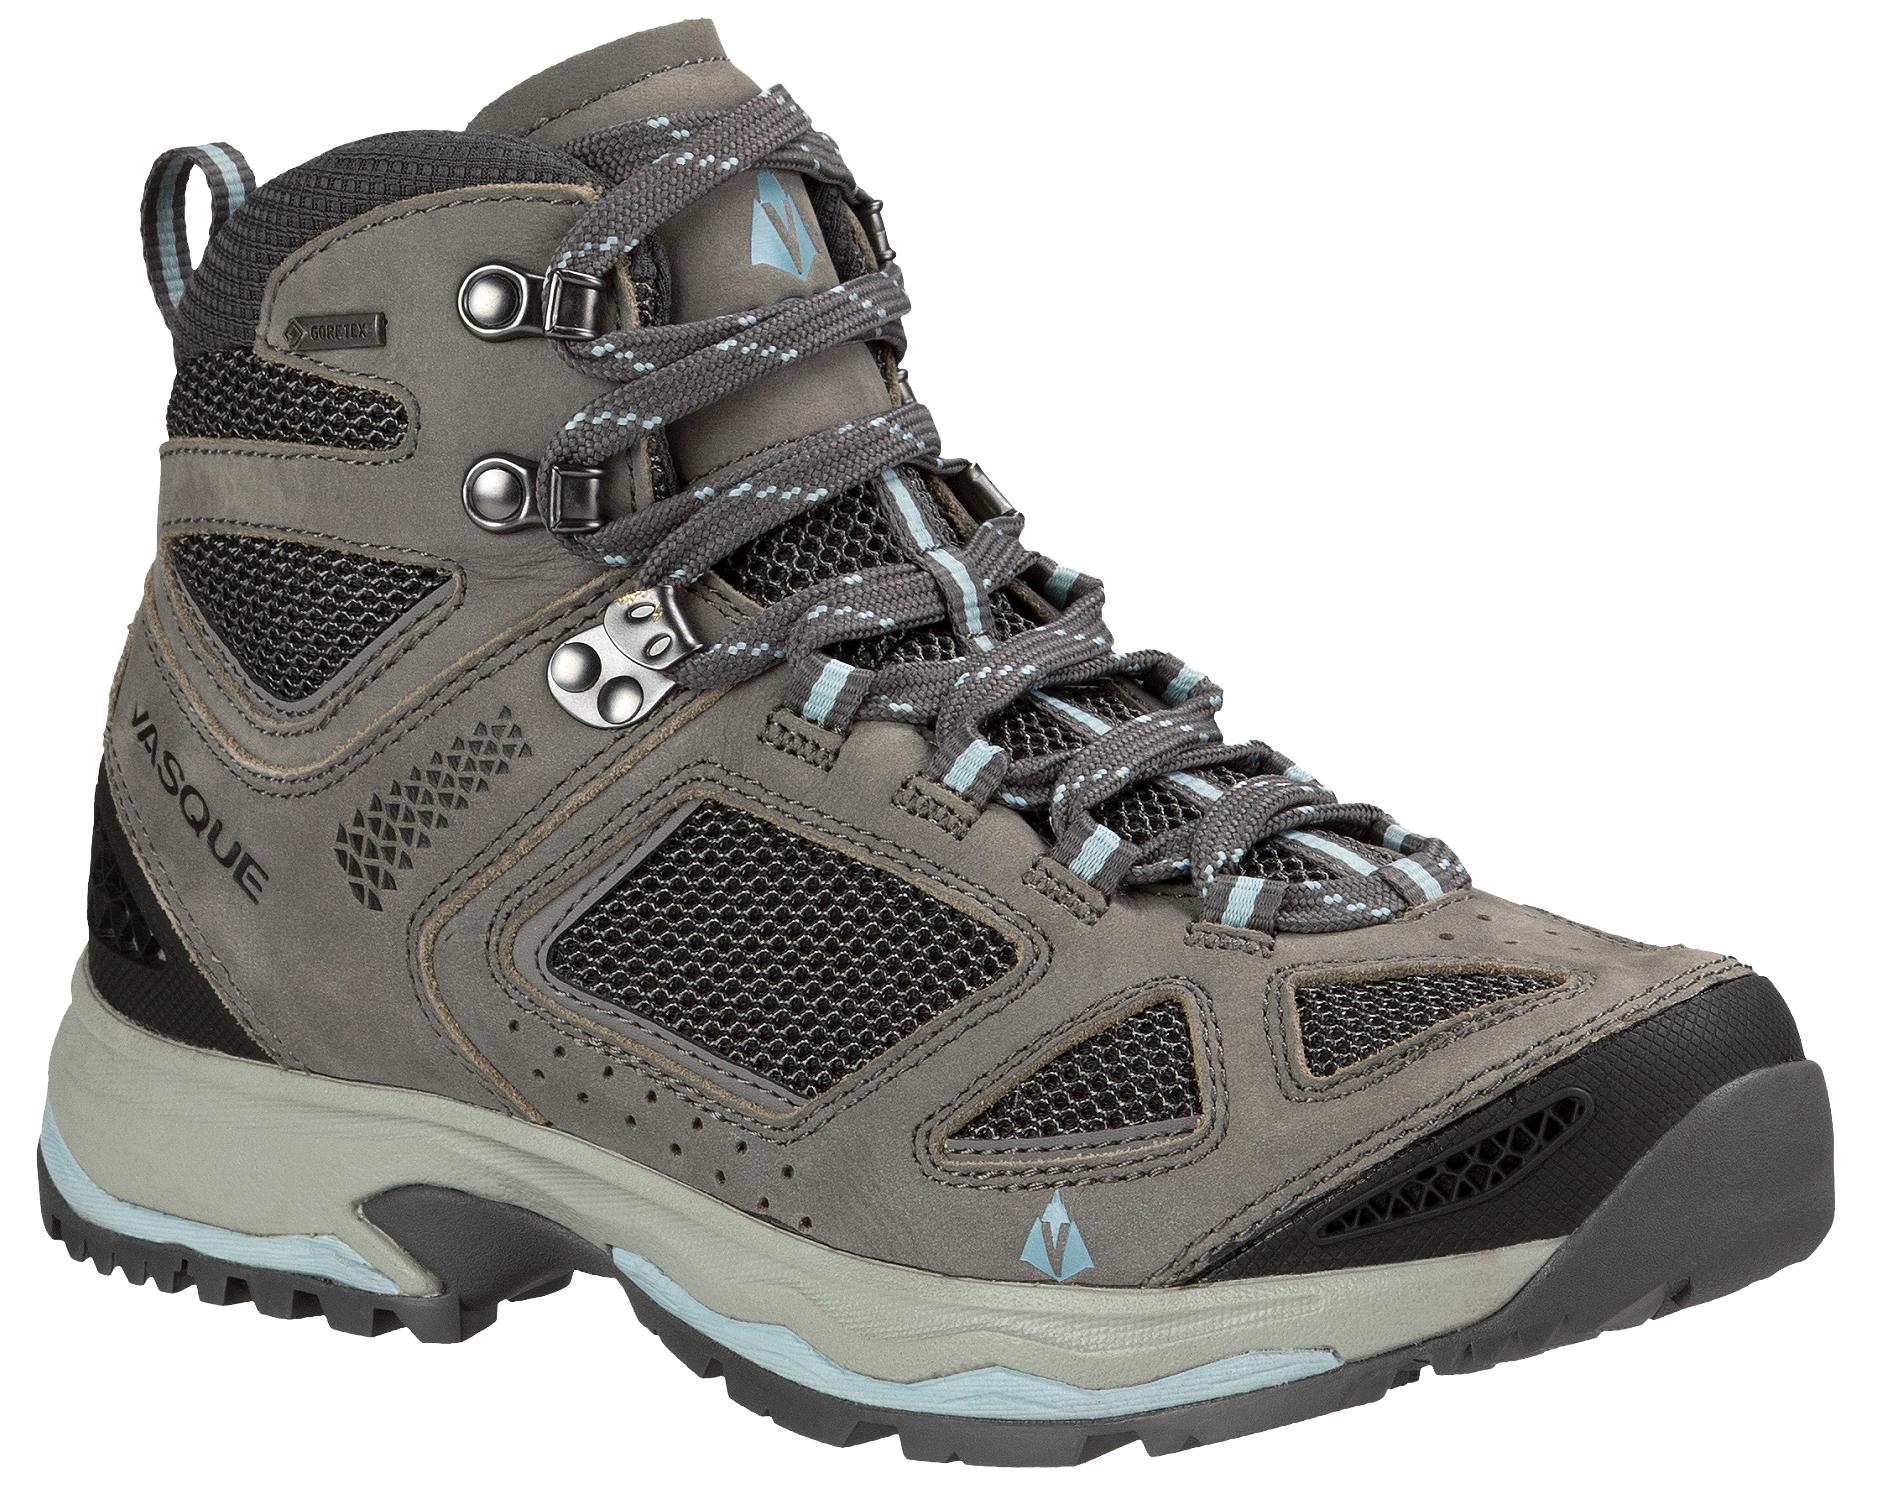 fce052d2694 Hiking boots | MEC